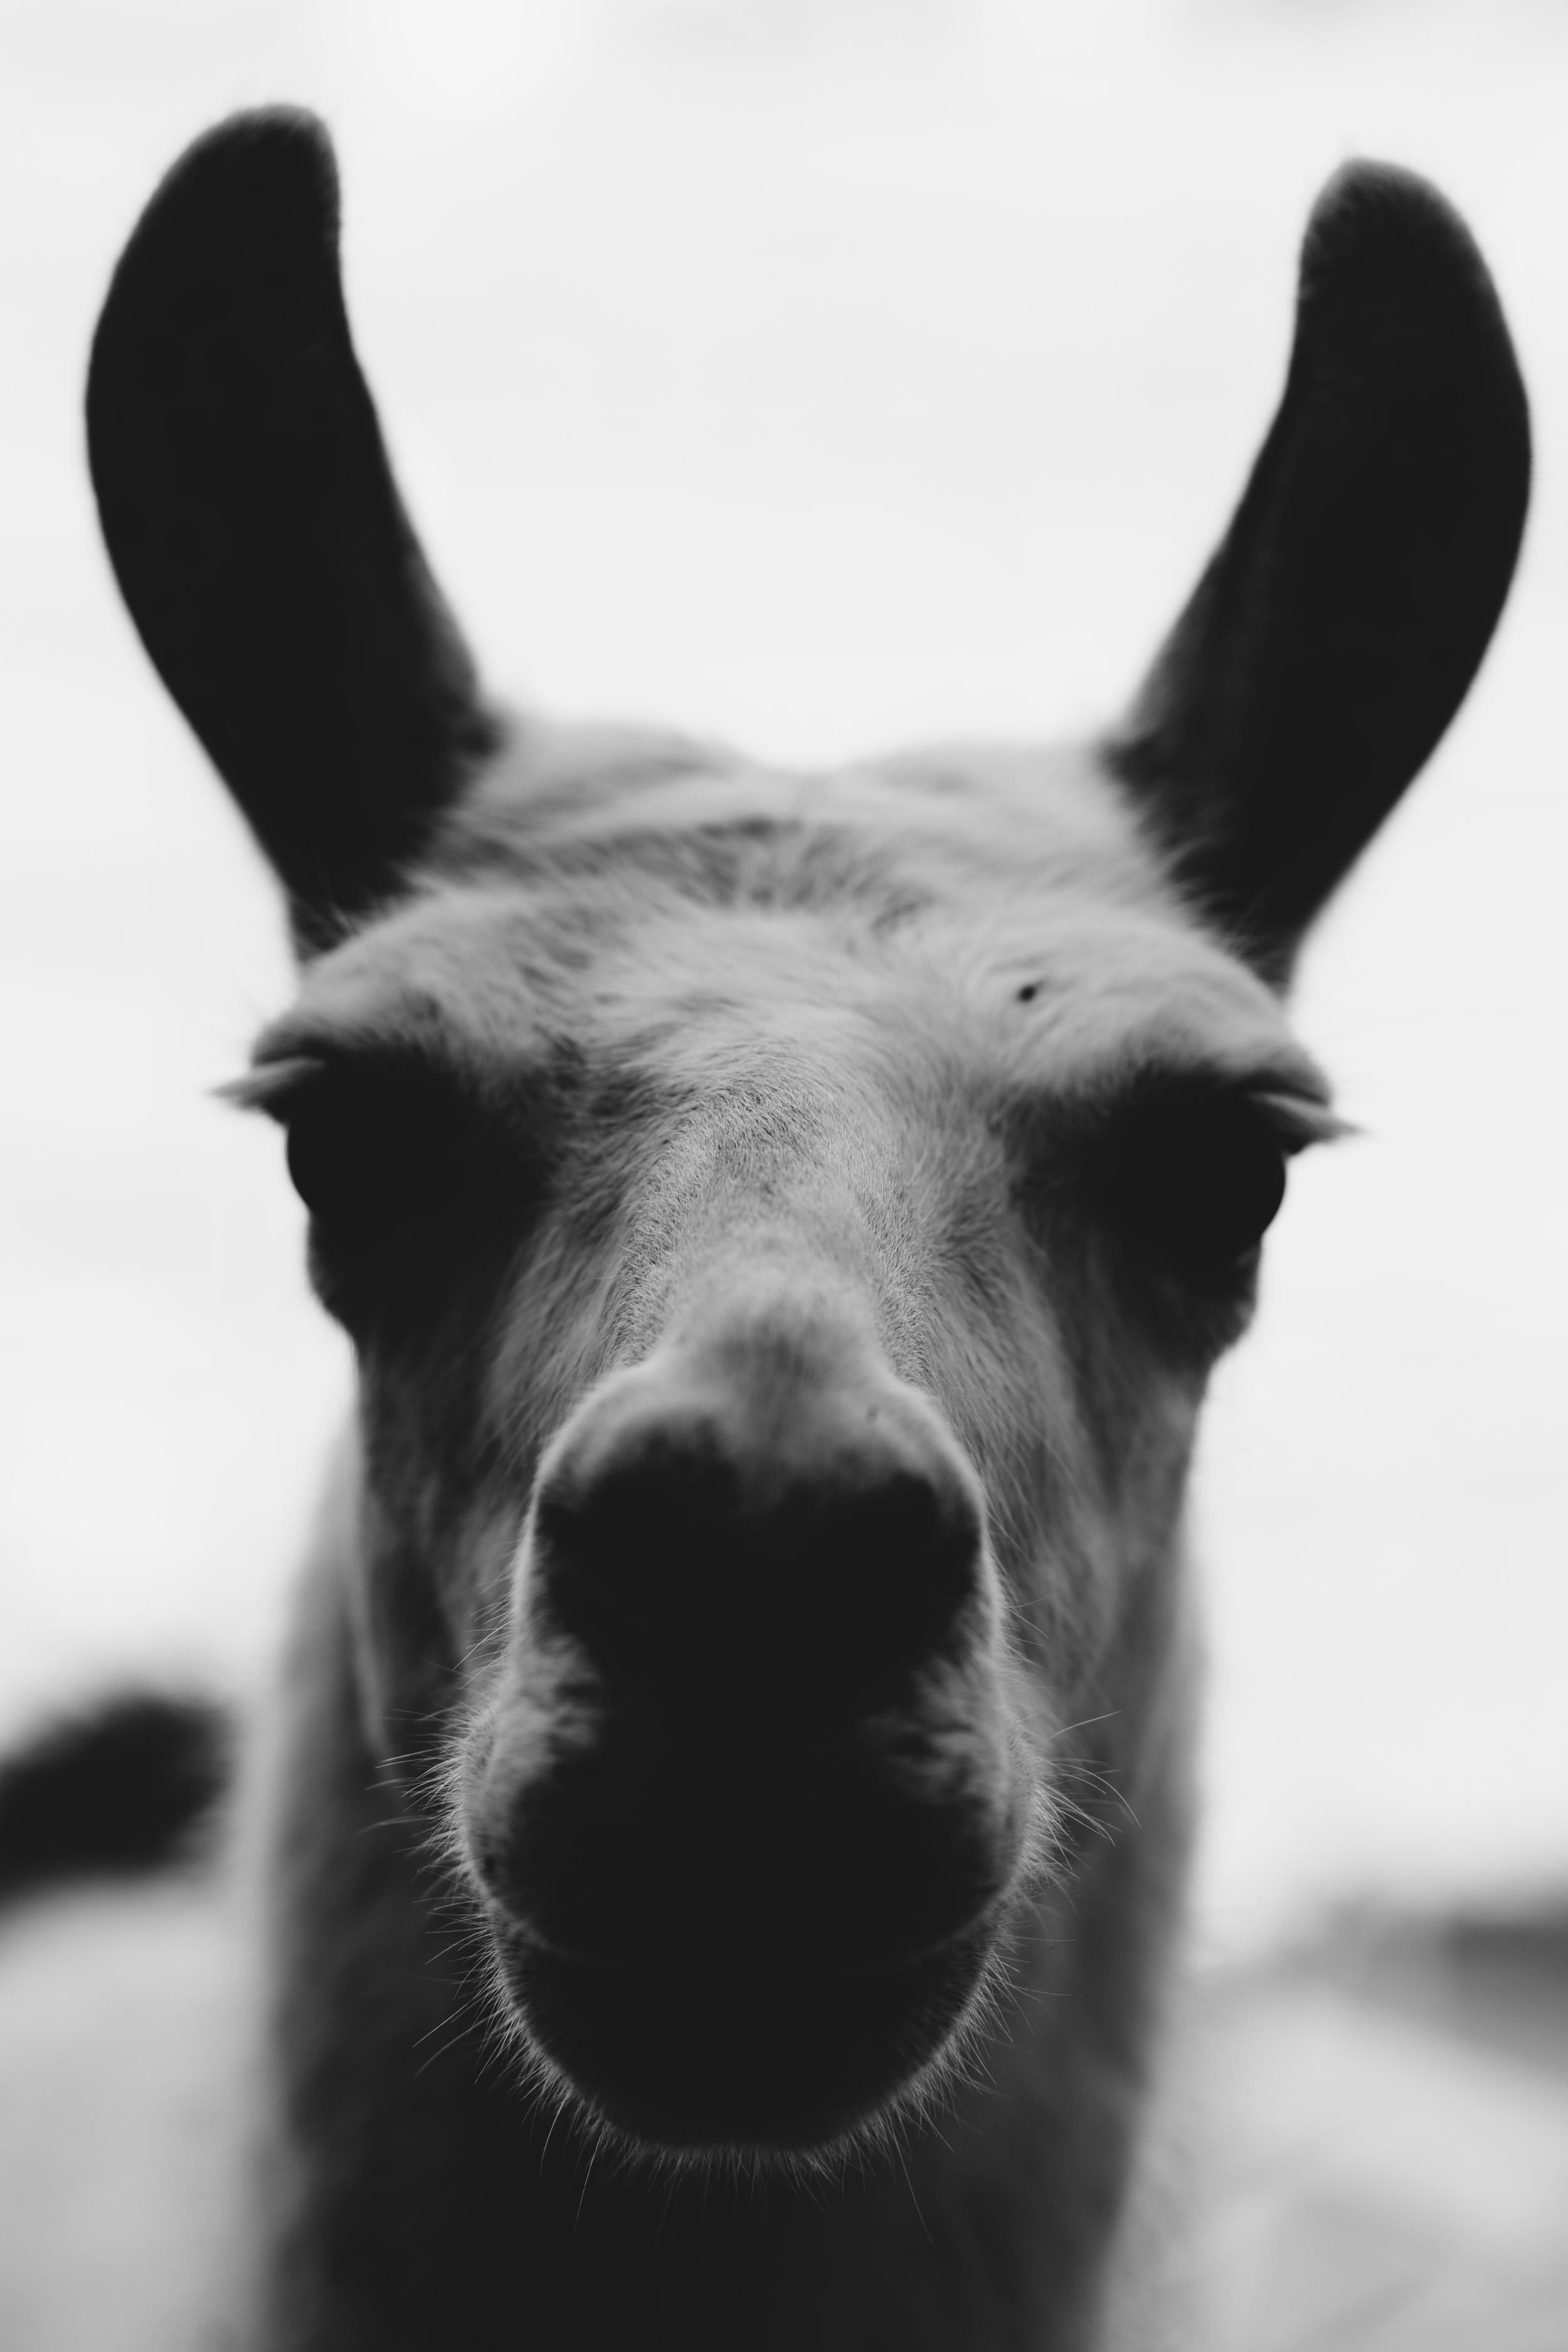 Llama / Plant Eating Shithead